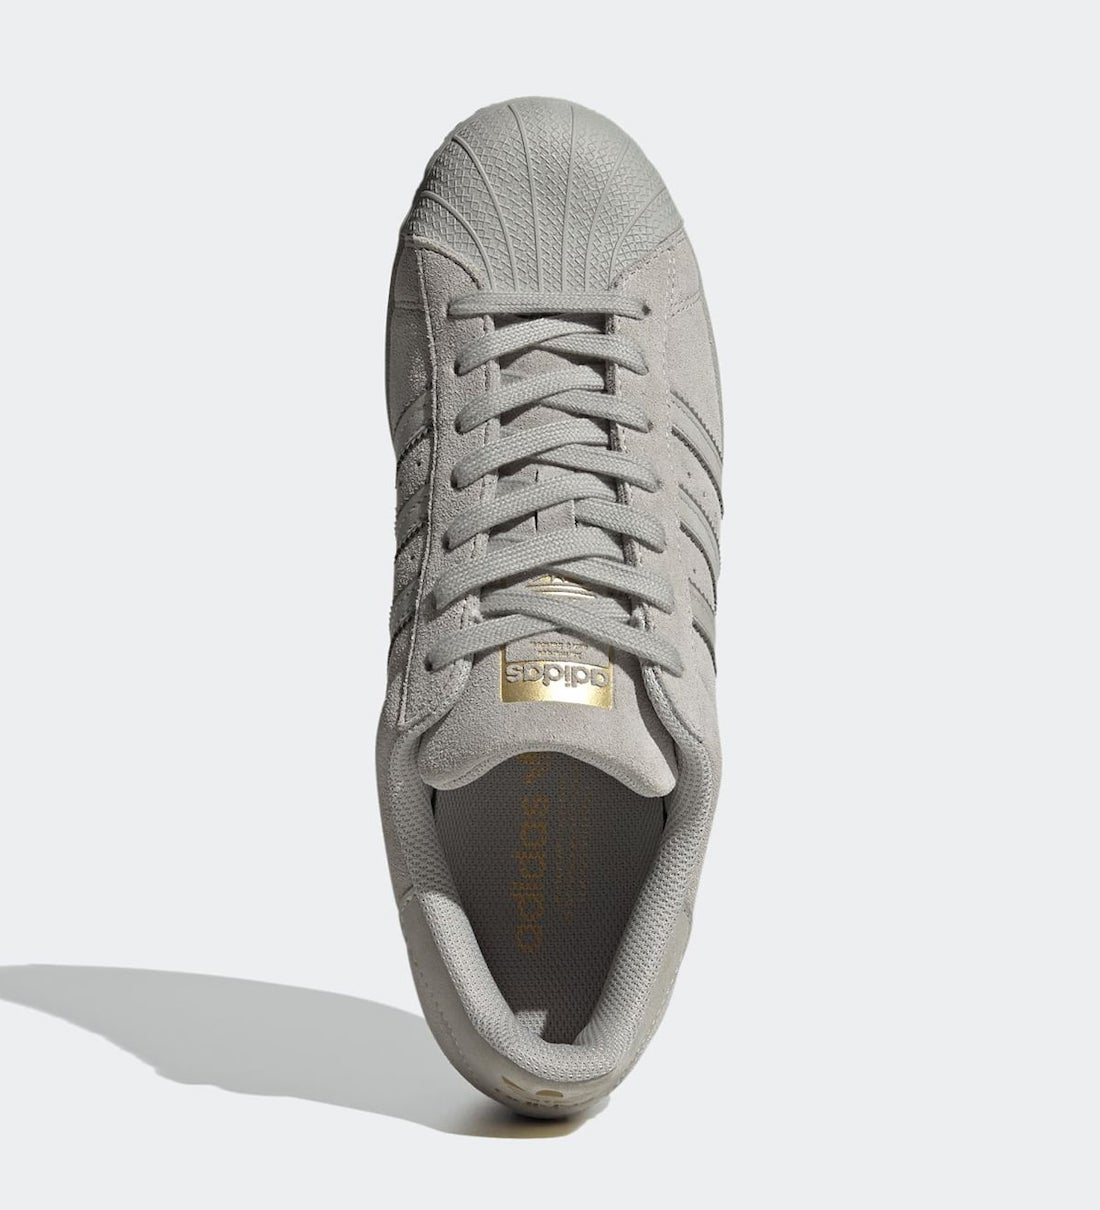 adidas Superstar FY2321